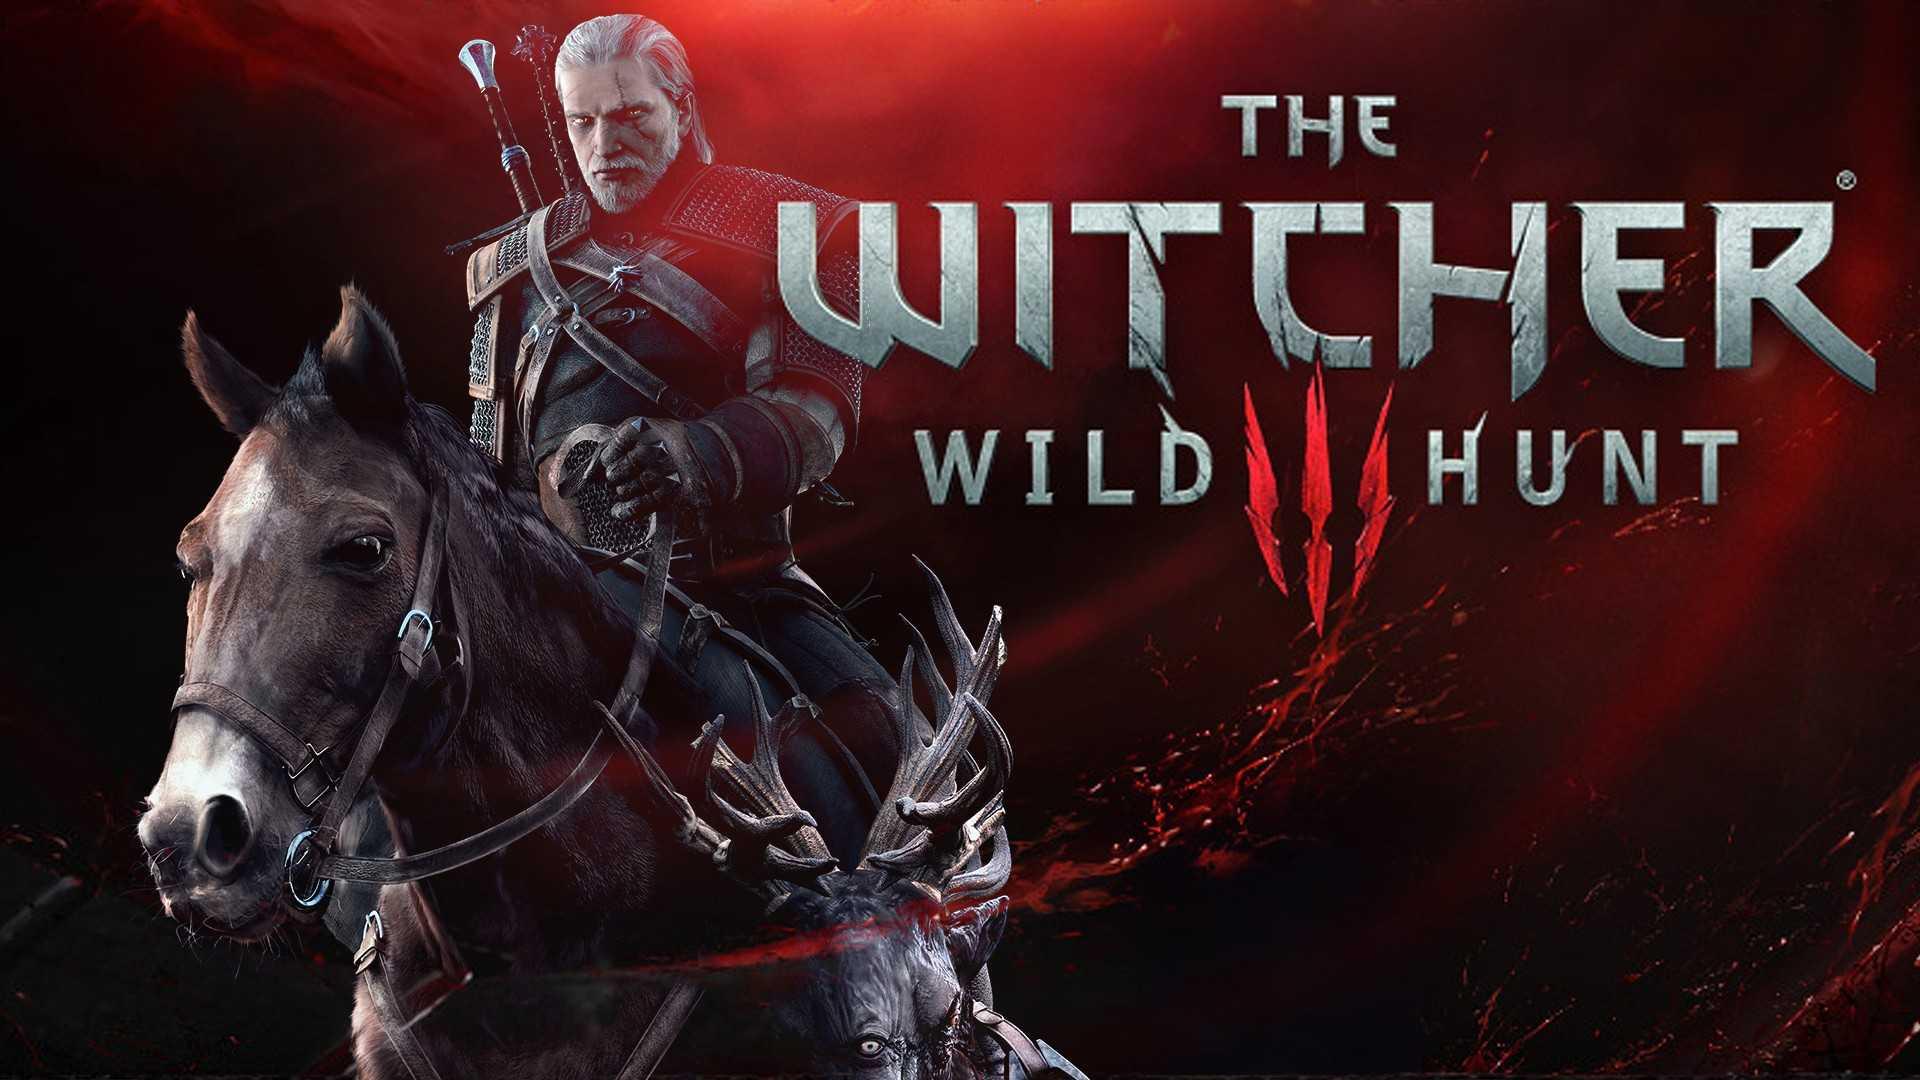 The Witcher 3: Wild Hunt побила 4-летний рекорд одновременного онлайна